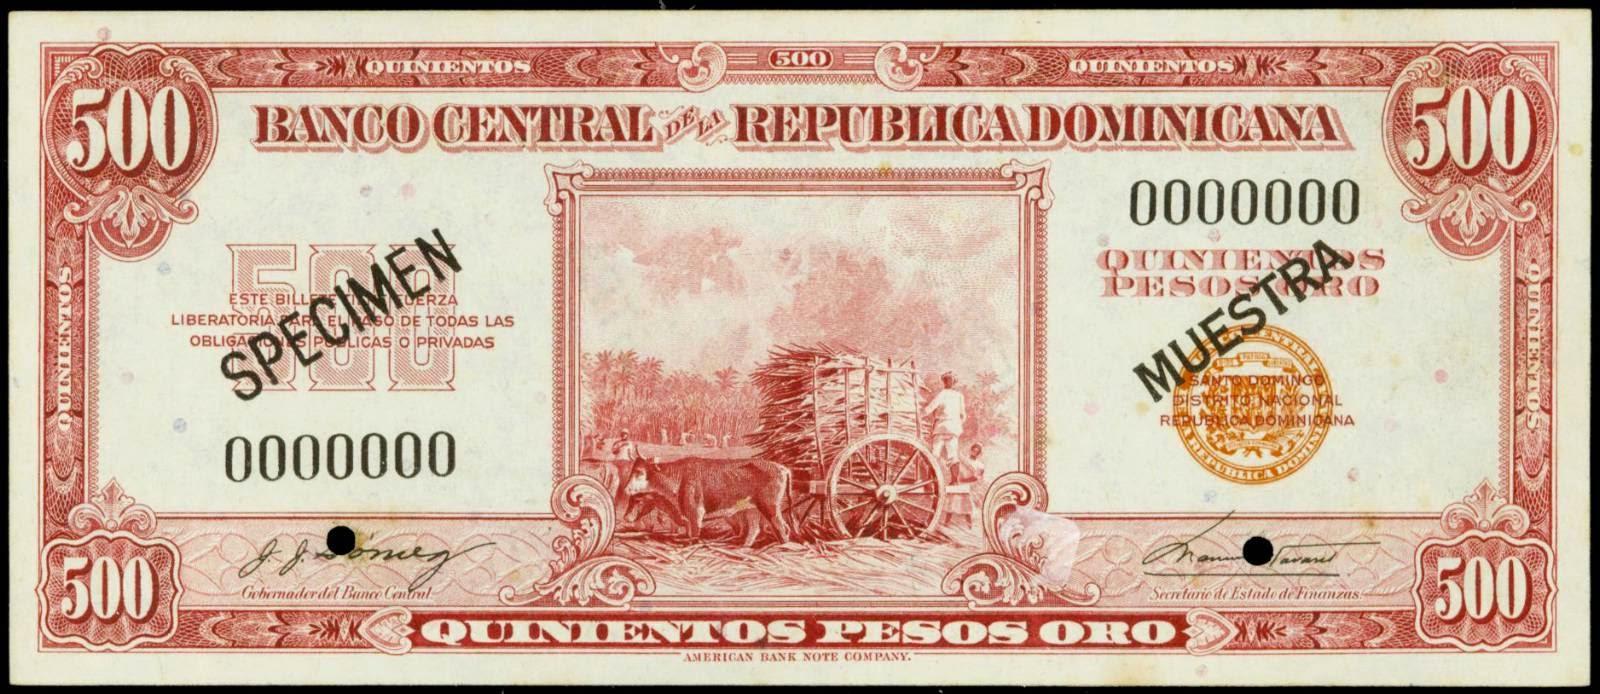 Dominican Republic currency banknotes 500 Pesos Oro